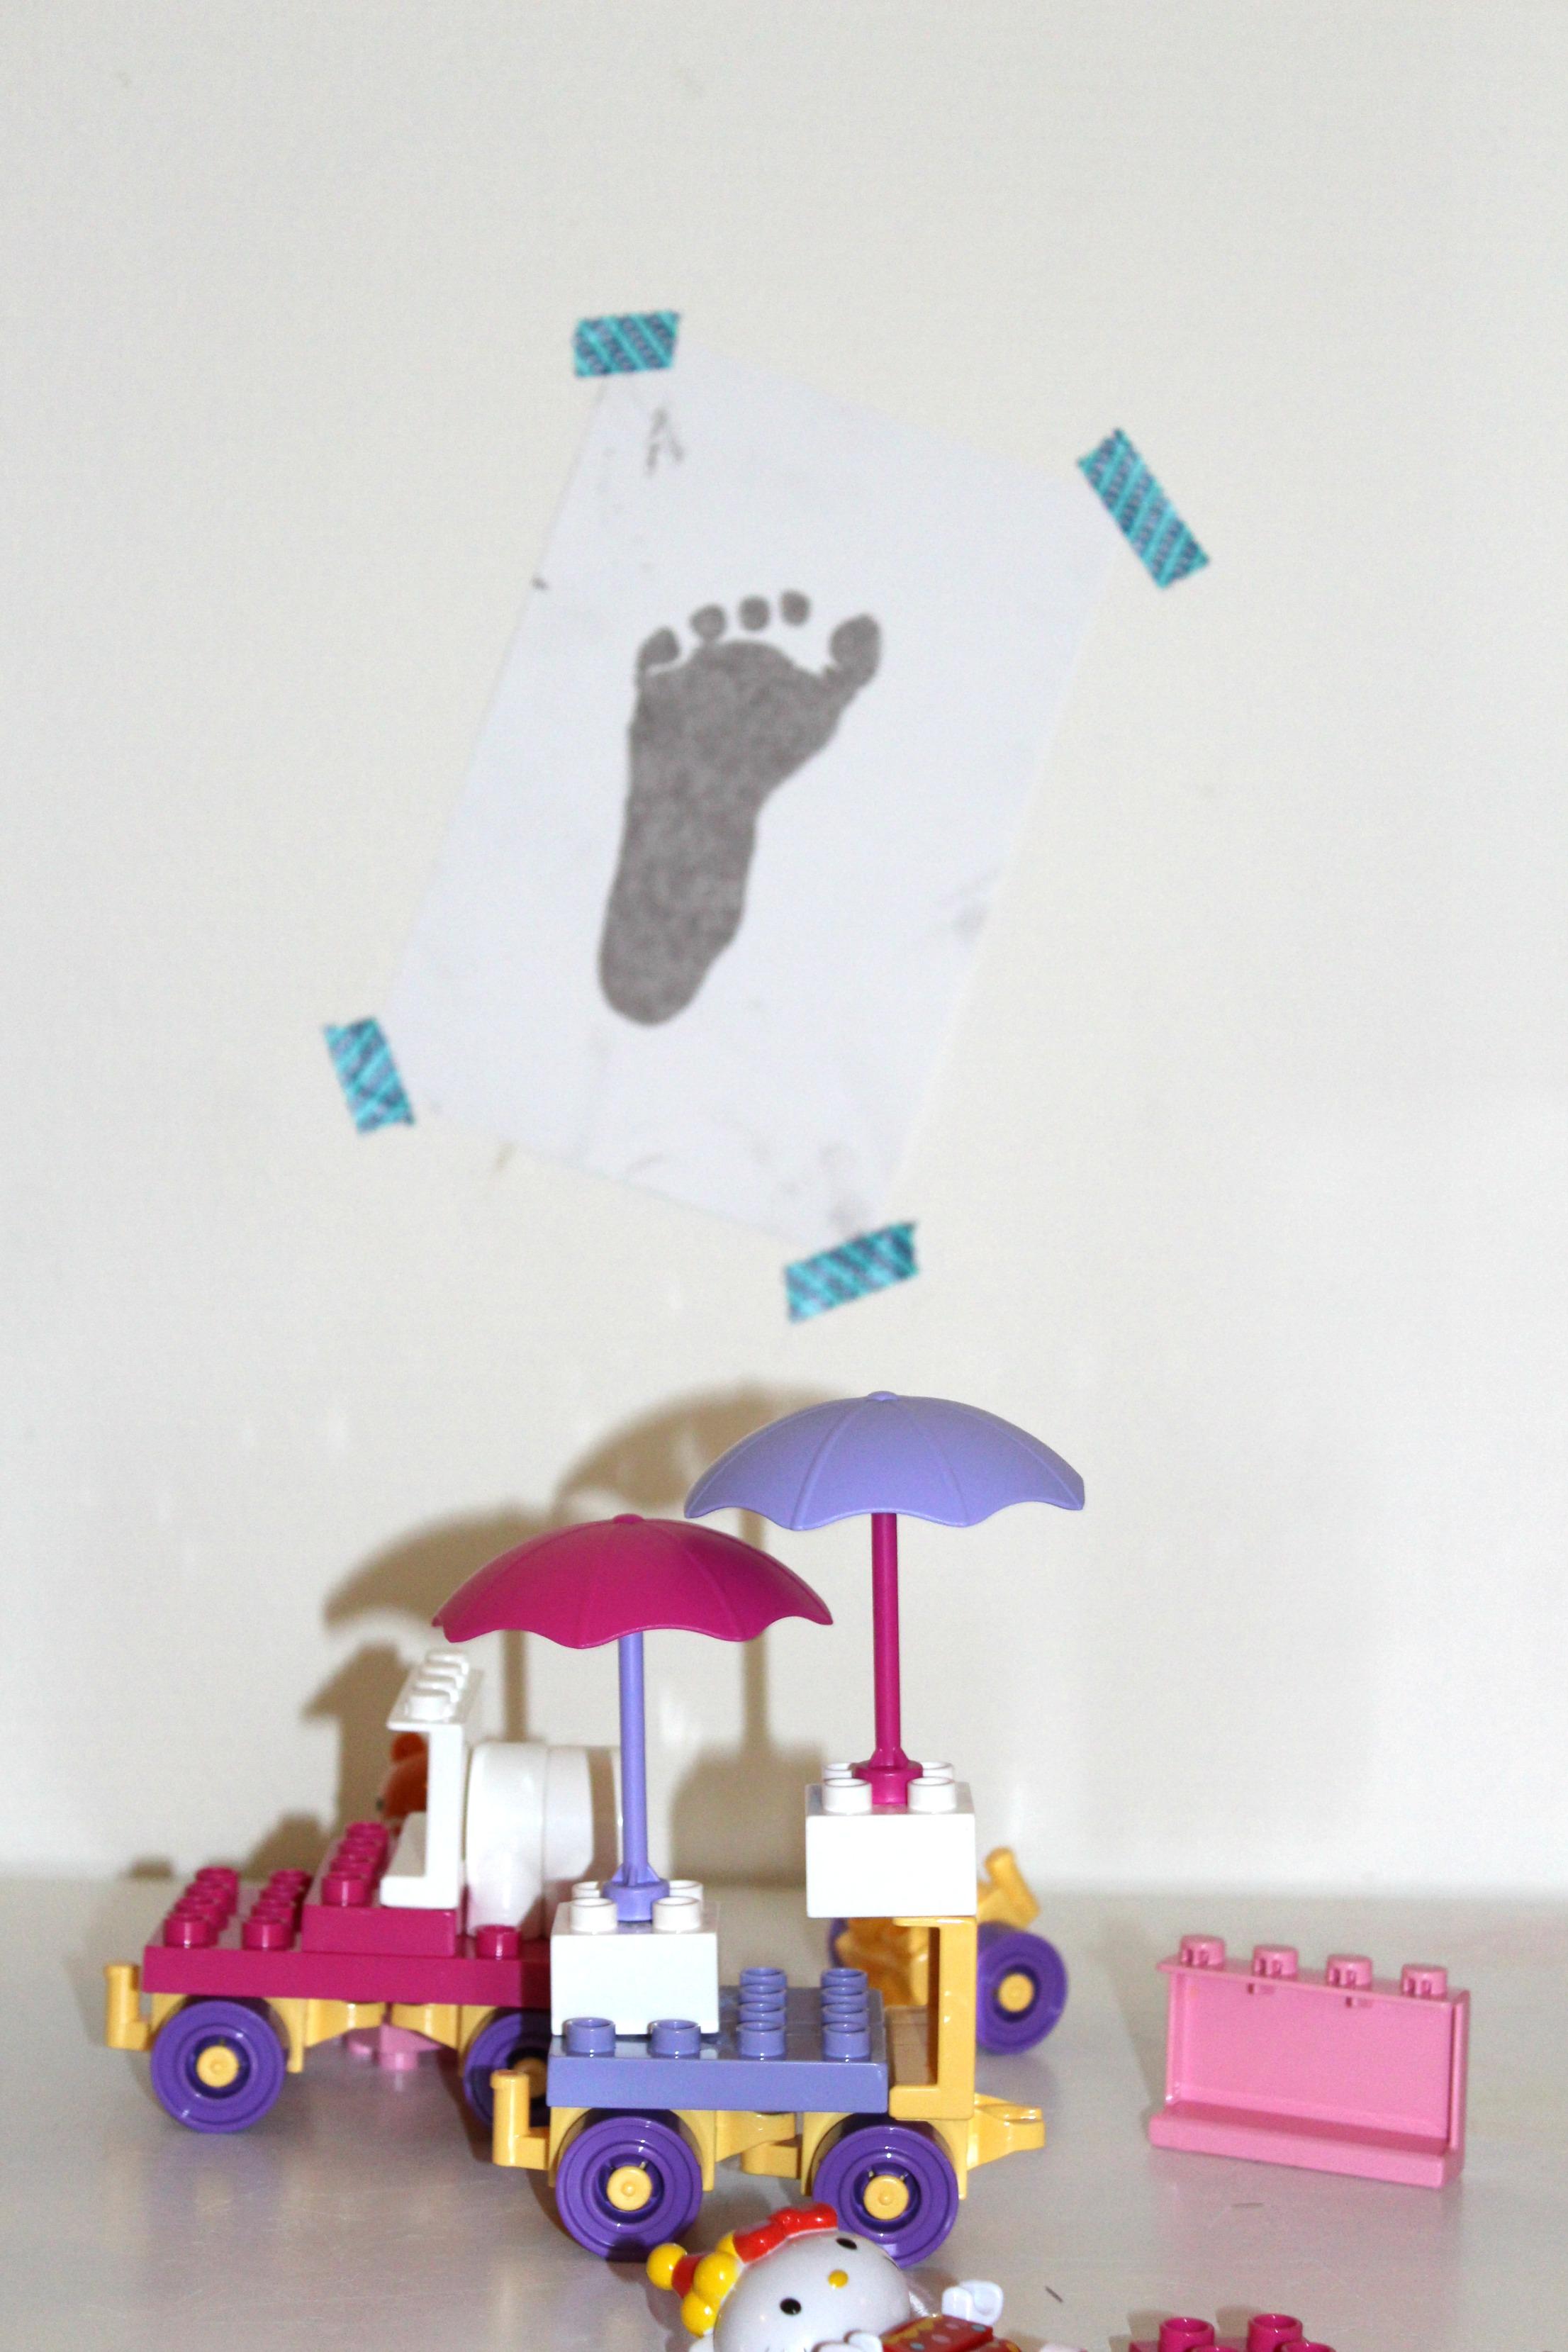 smallprint - voetadruk - baby - volgmama - winactie